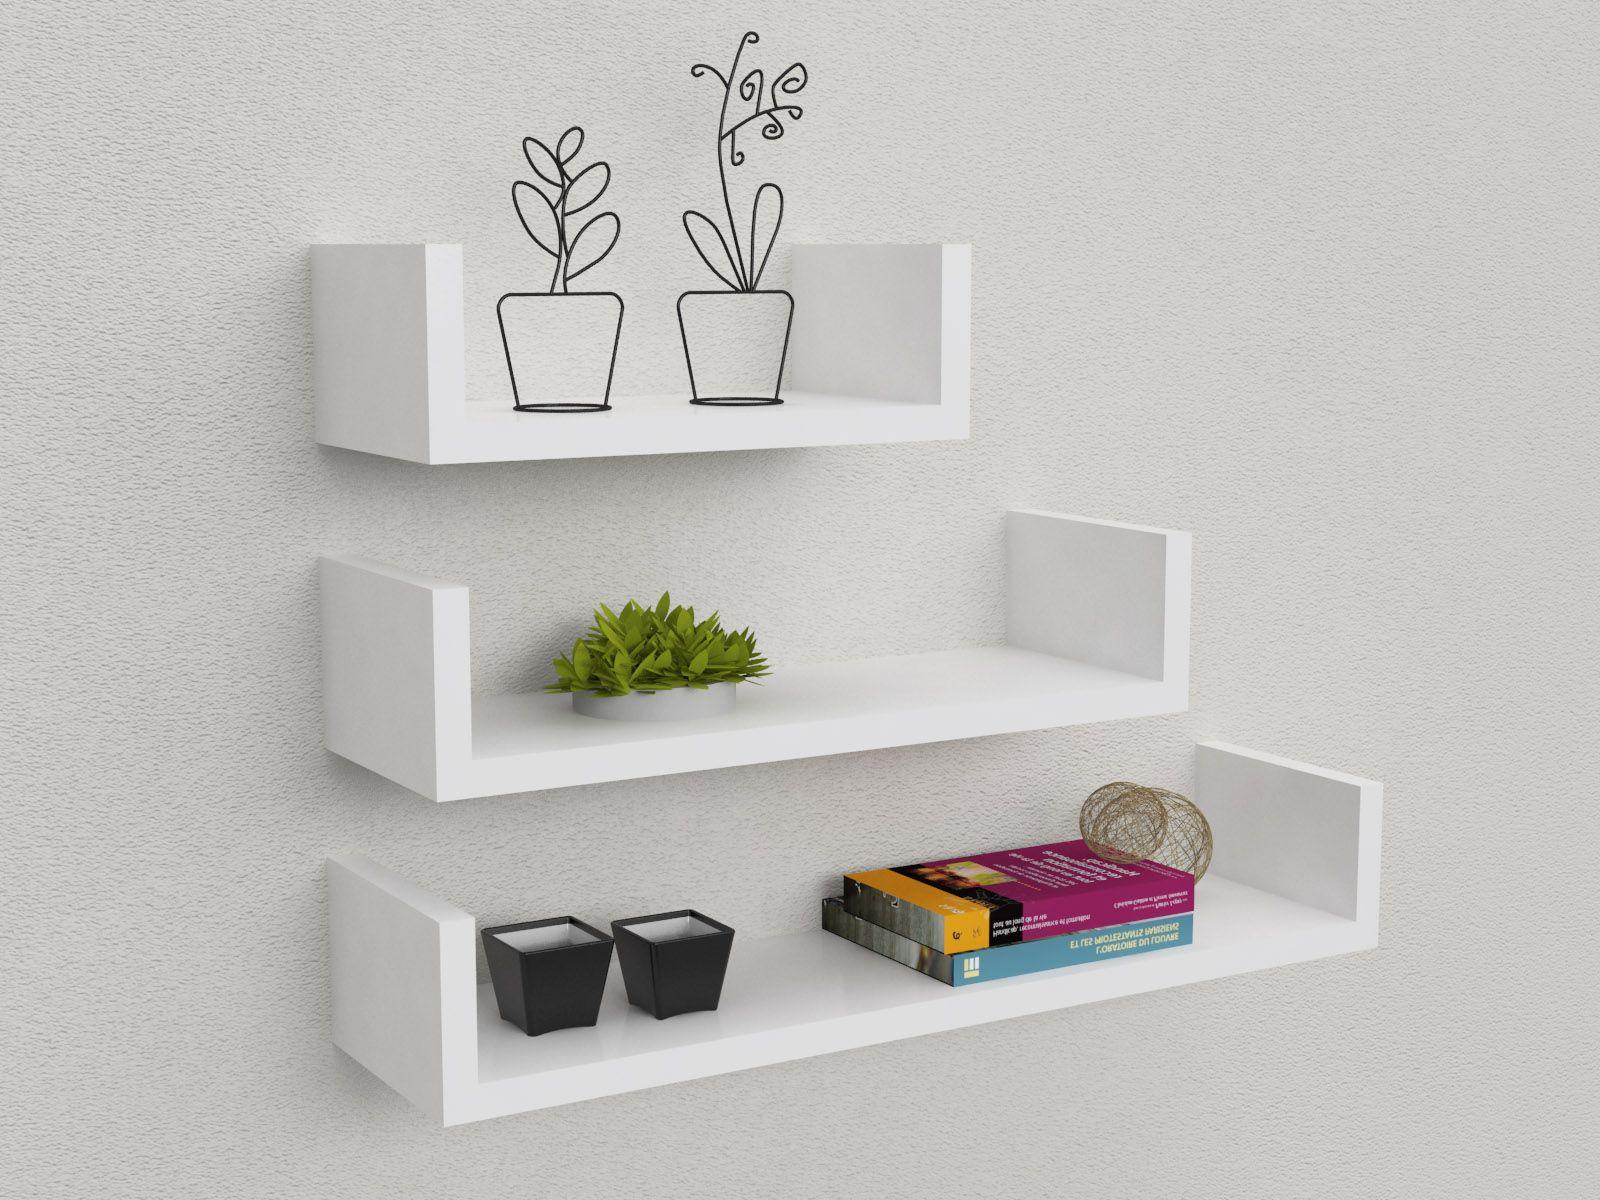 Kit 3 mensole design 30-45-60 cm in mdf, design minimale, semplici ...